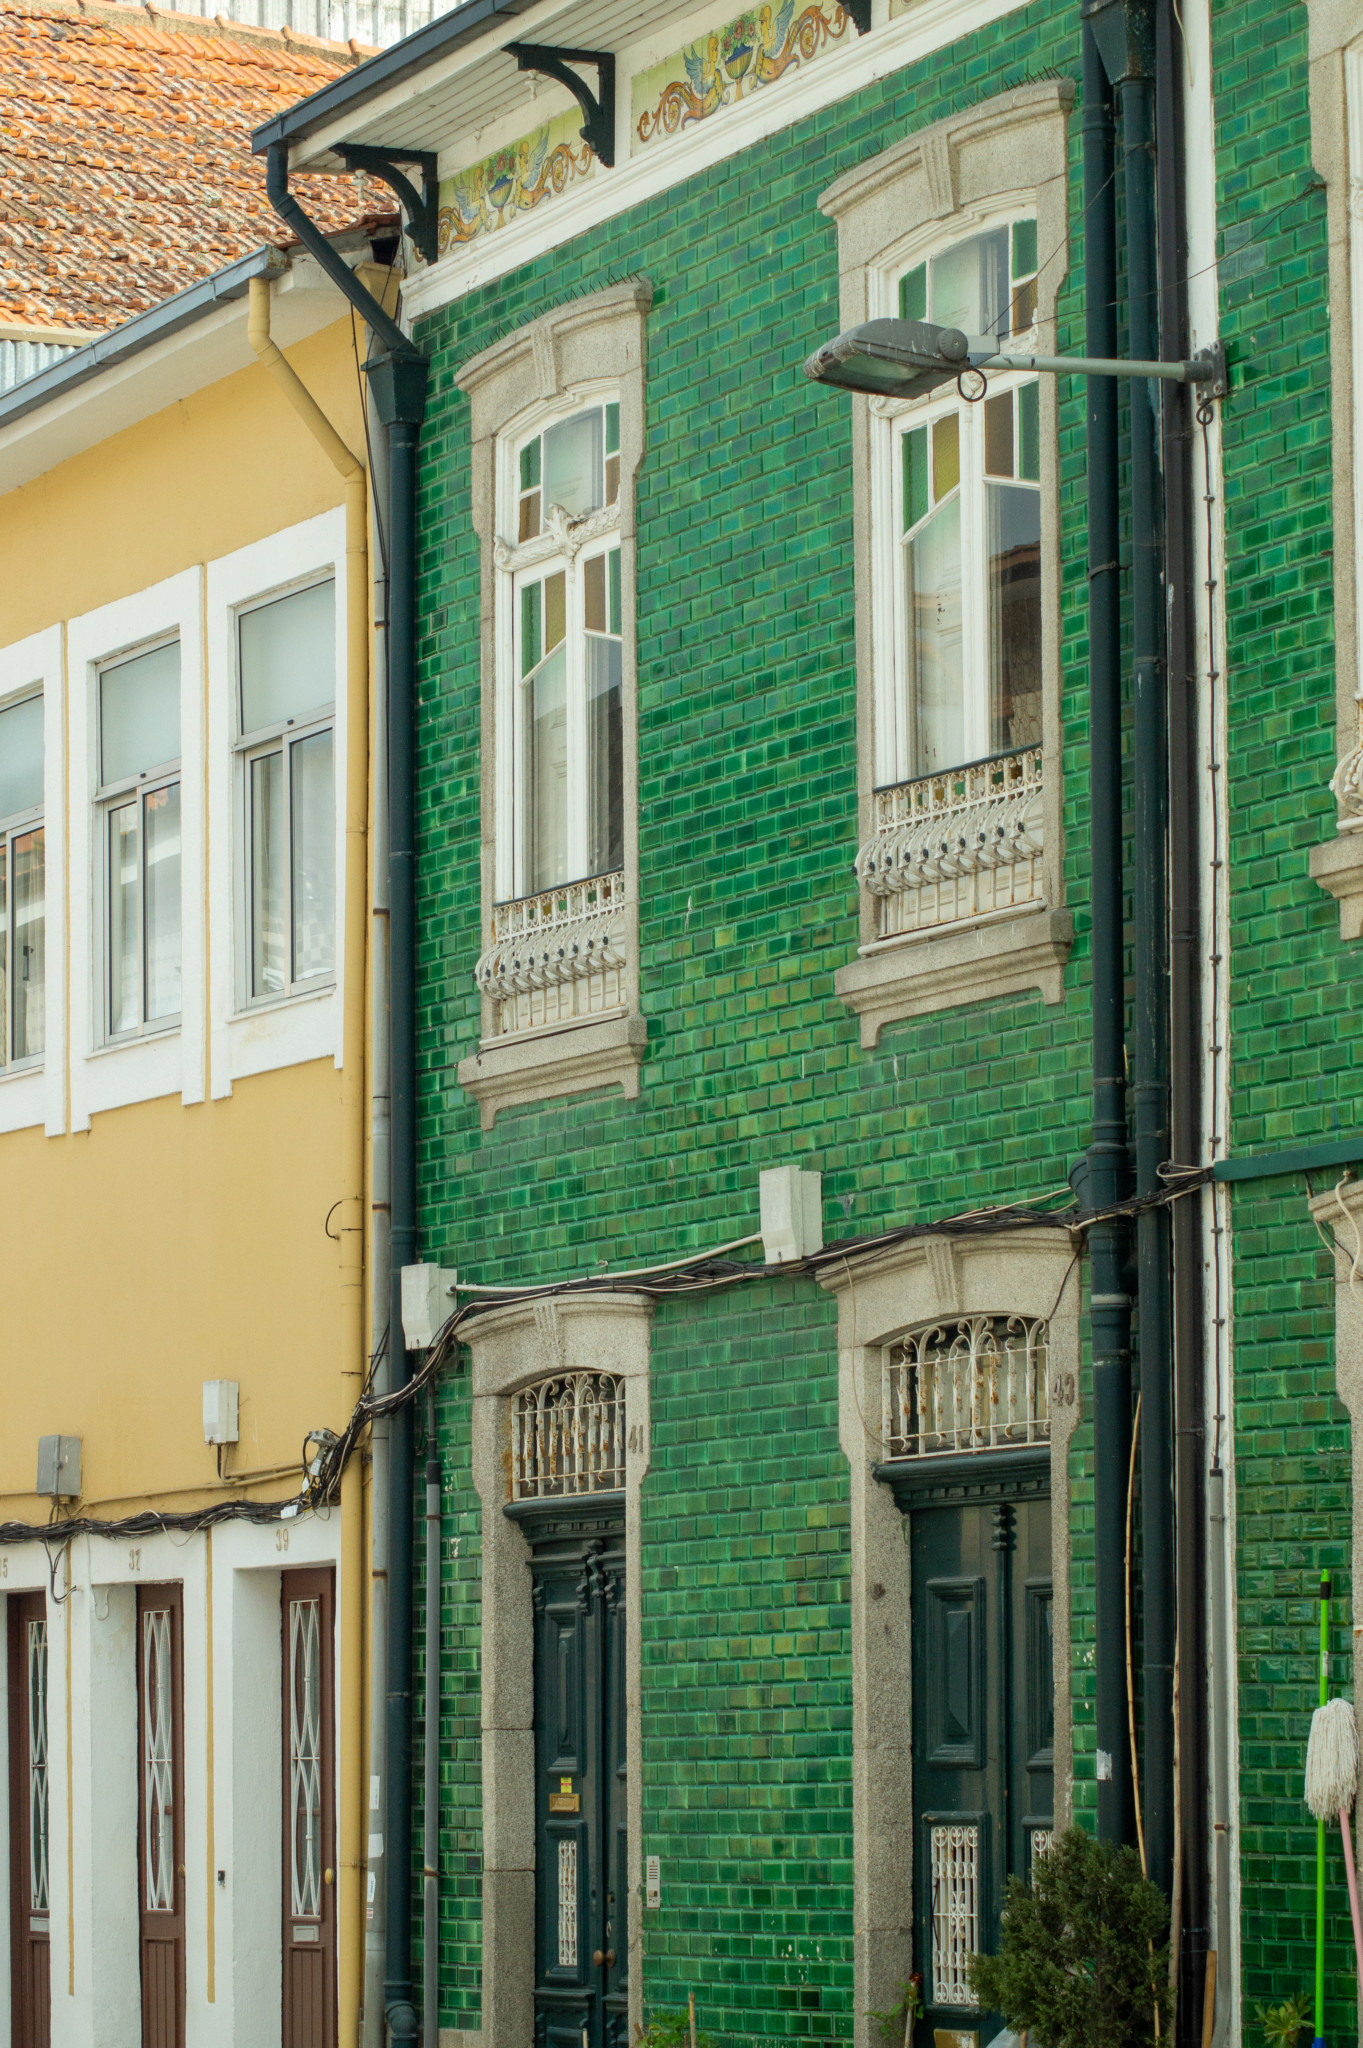 Architektur in Afurada